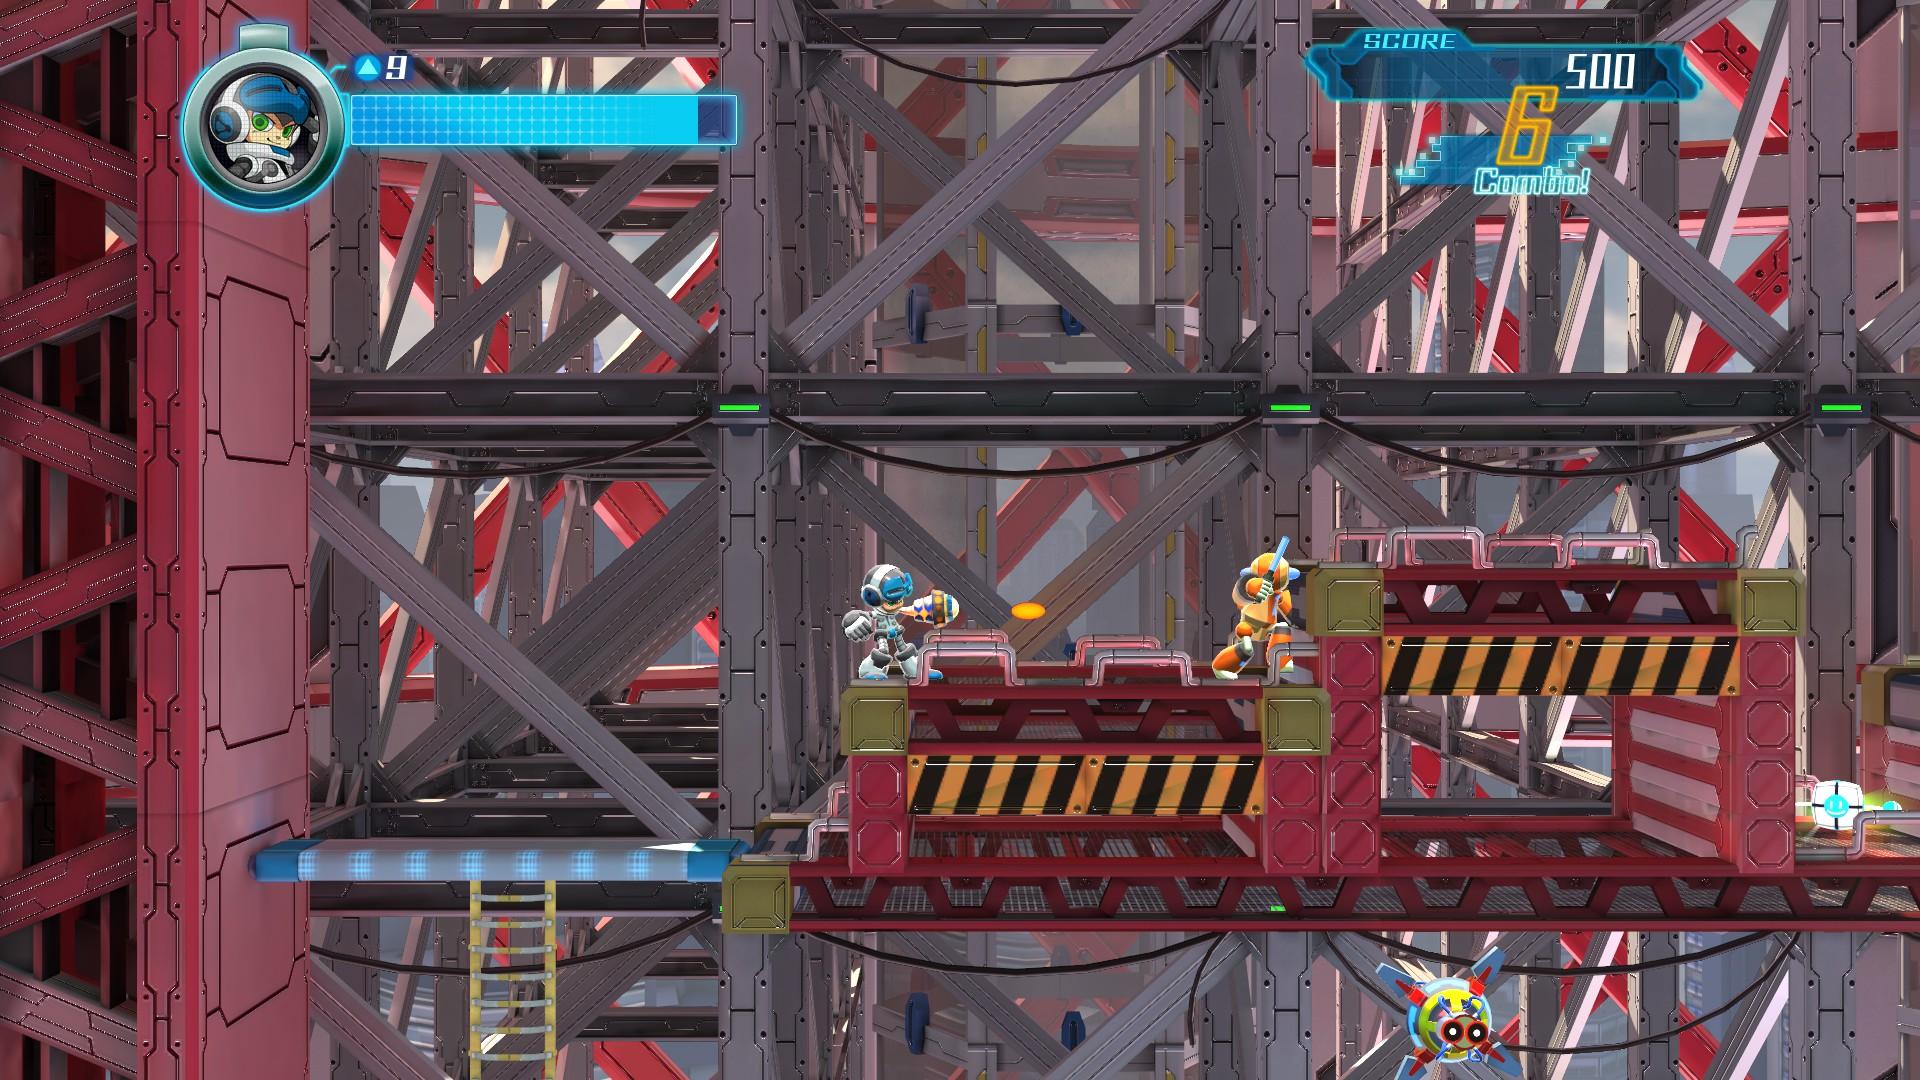 Mighty No. 9 screenshot